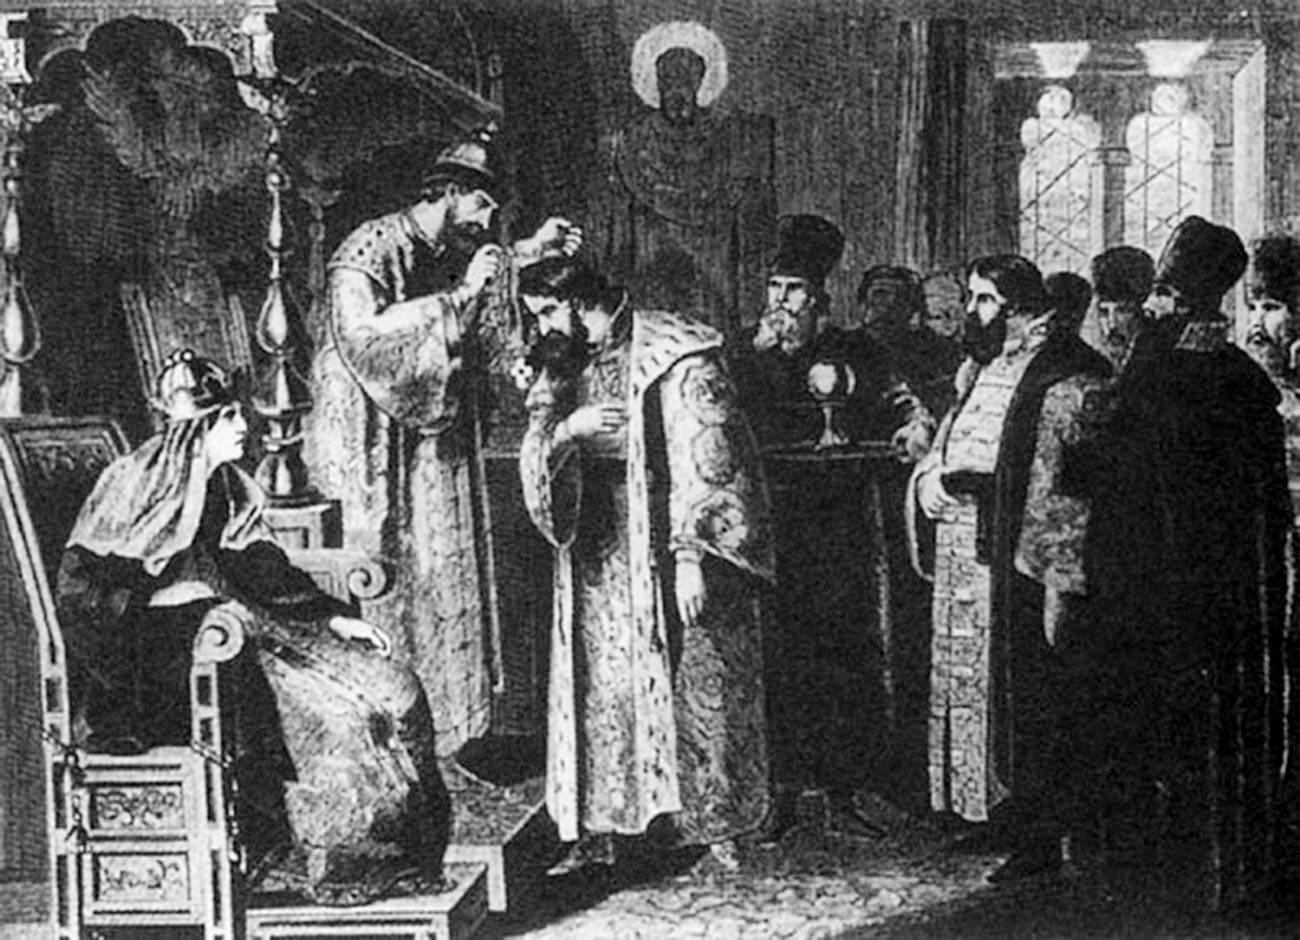 Le tsar Fédor met une chaîne en or sur Boris Godounov